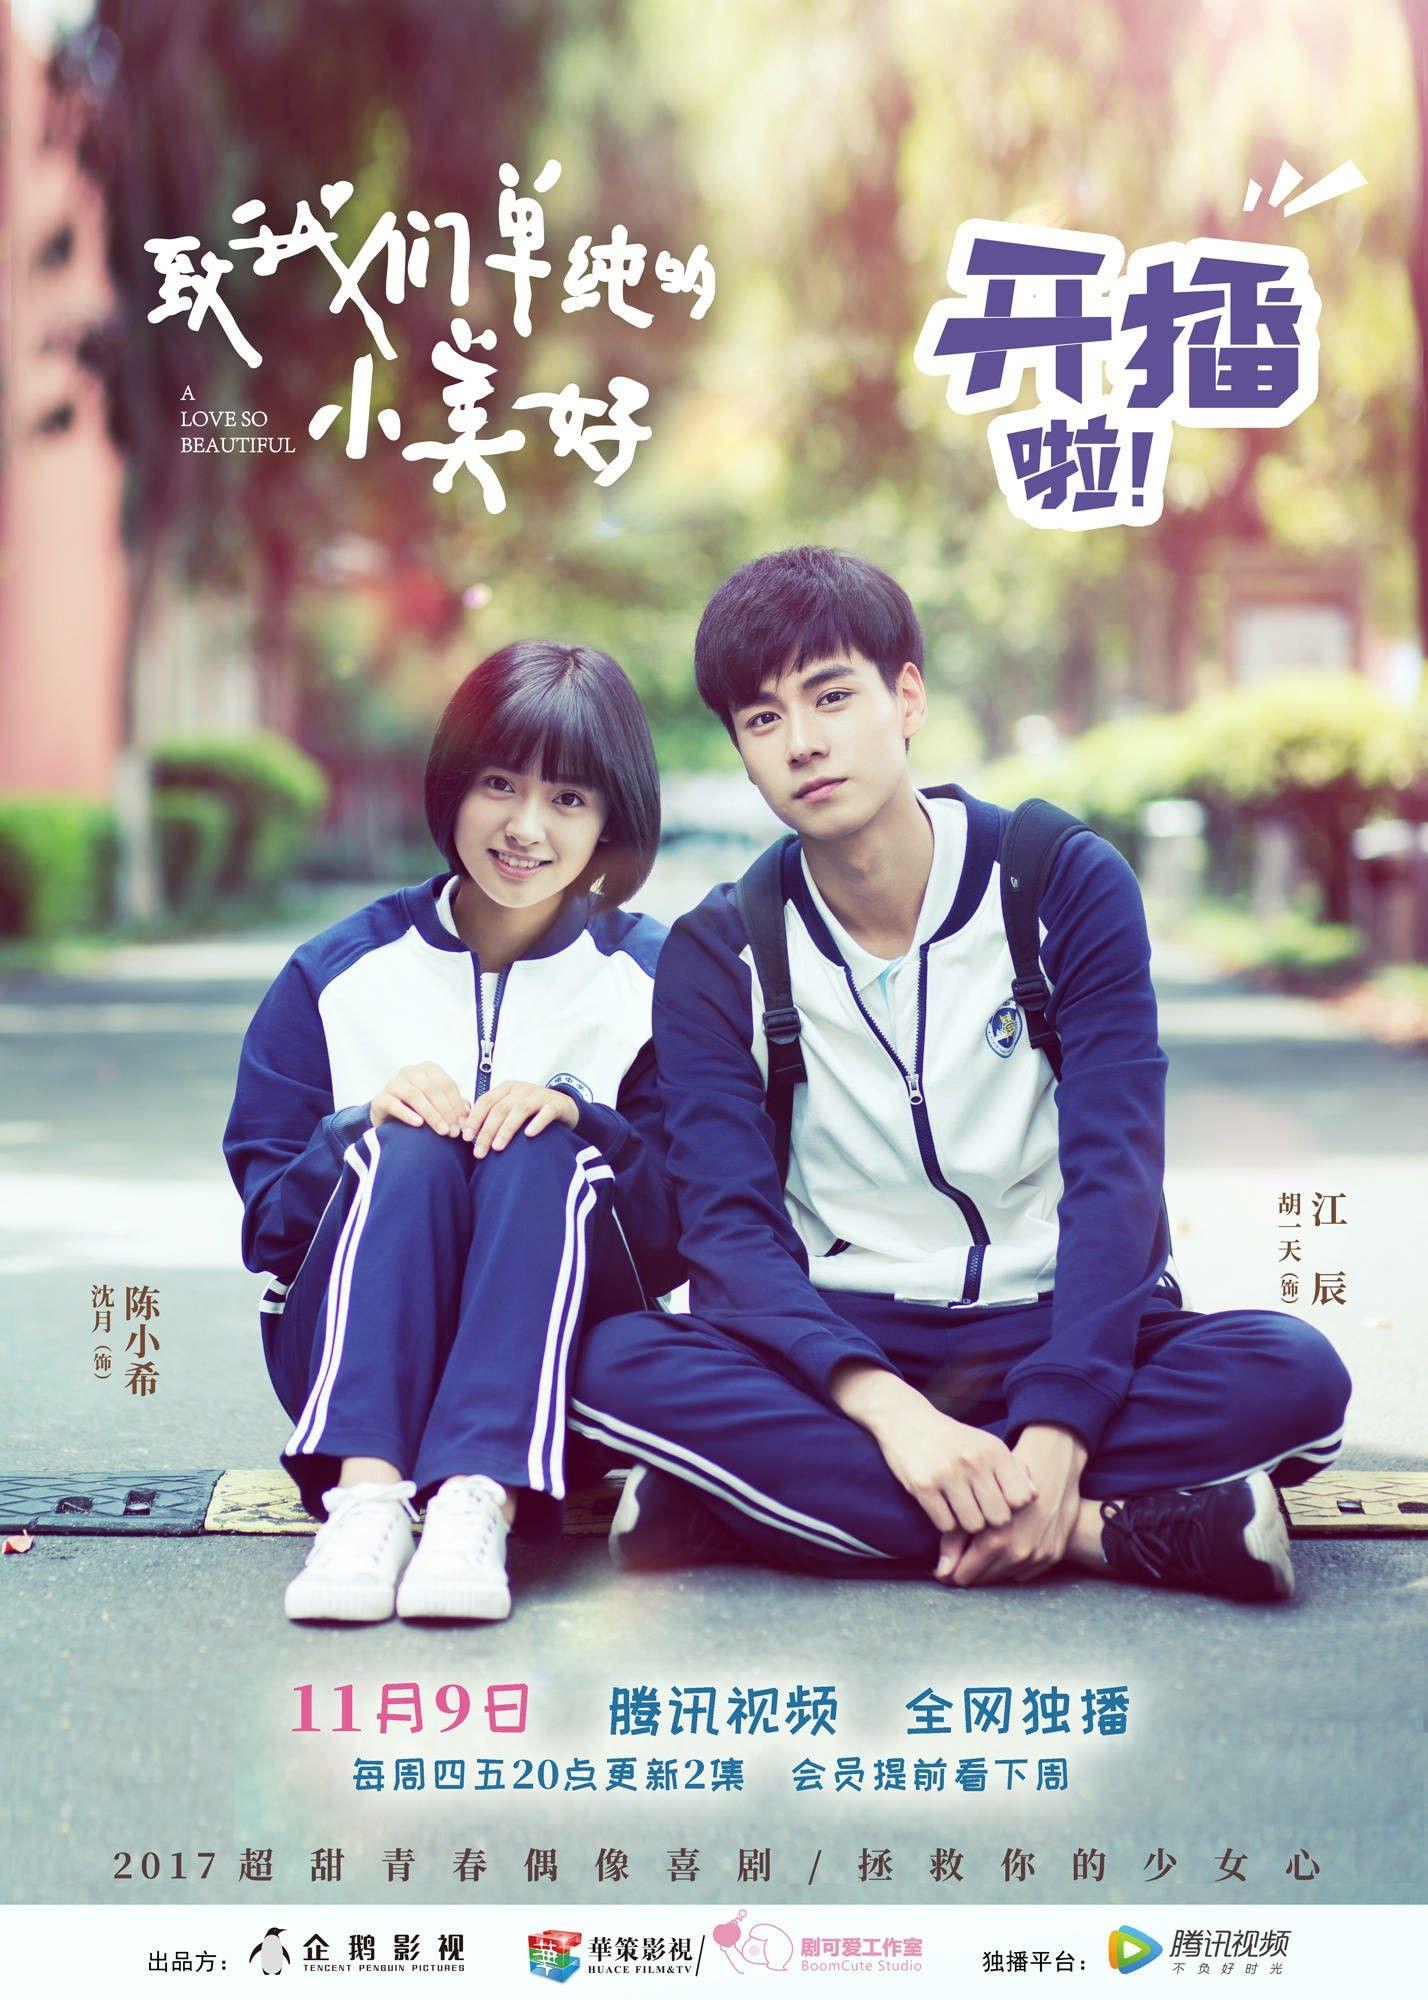 Drama A Love So Beautiful (Chinese 致我们单纯的小美好; pinyin